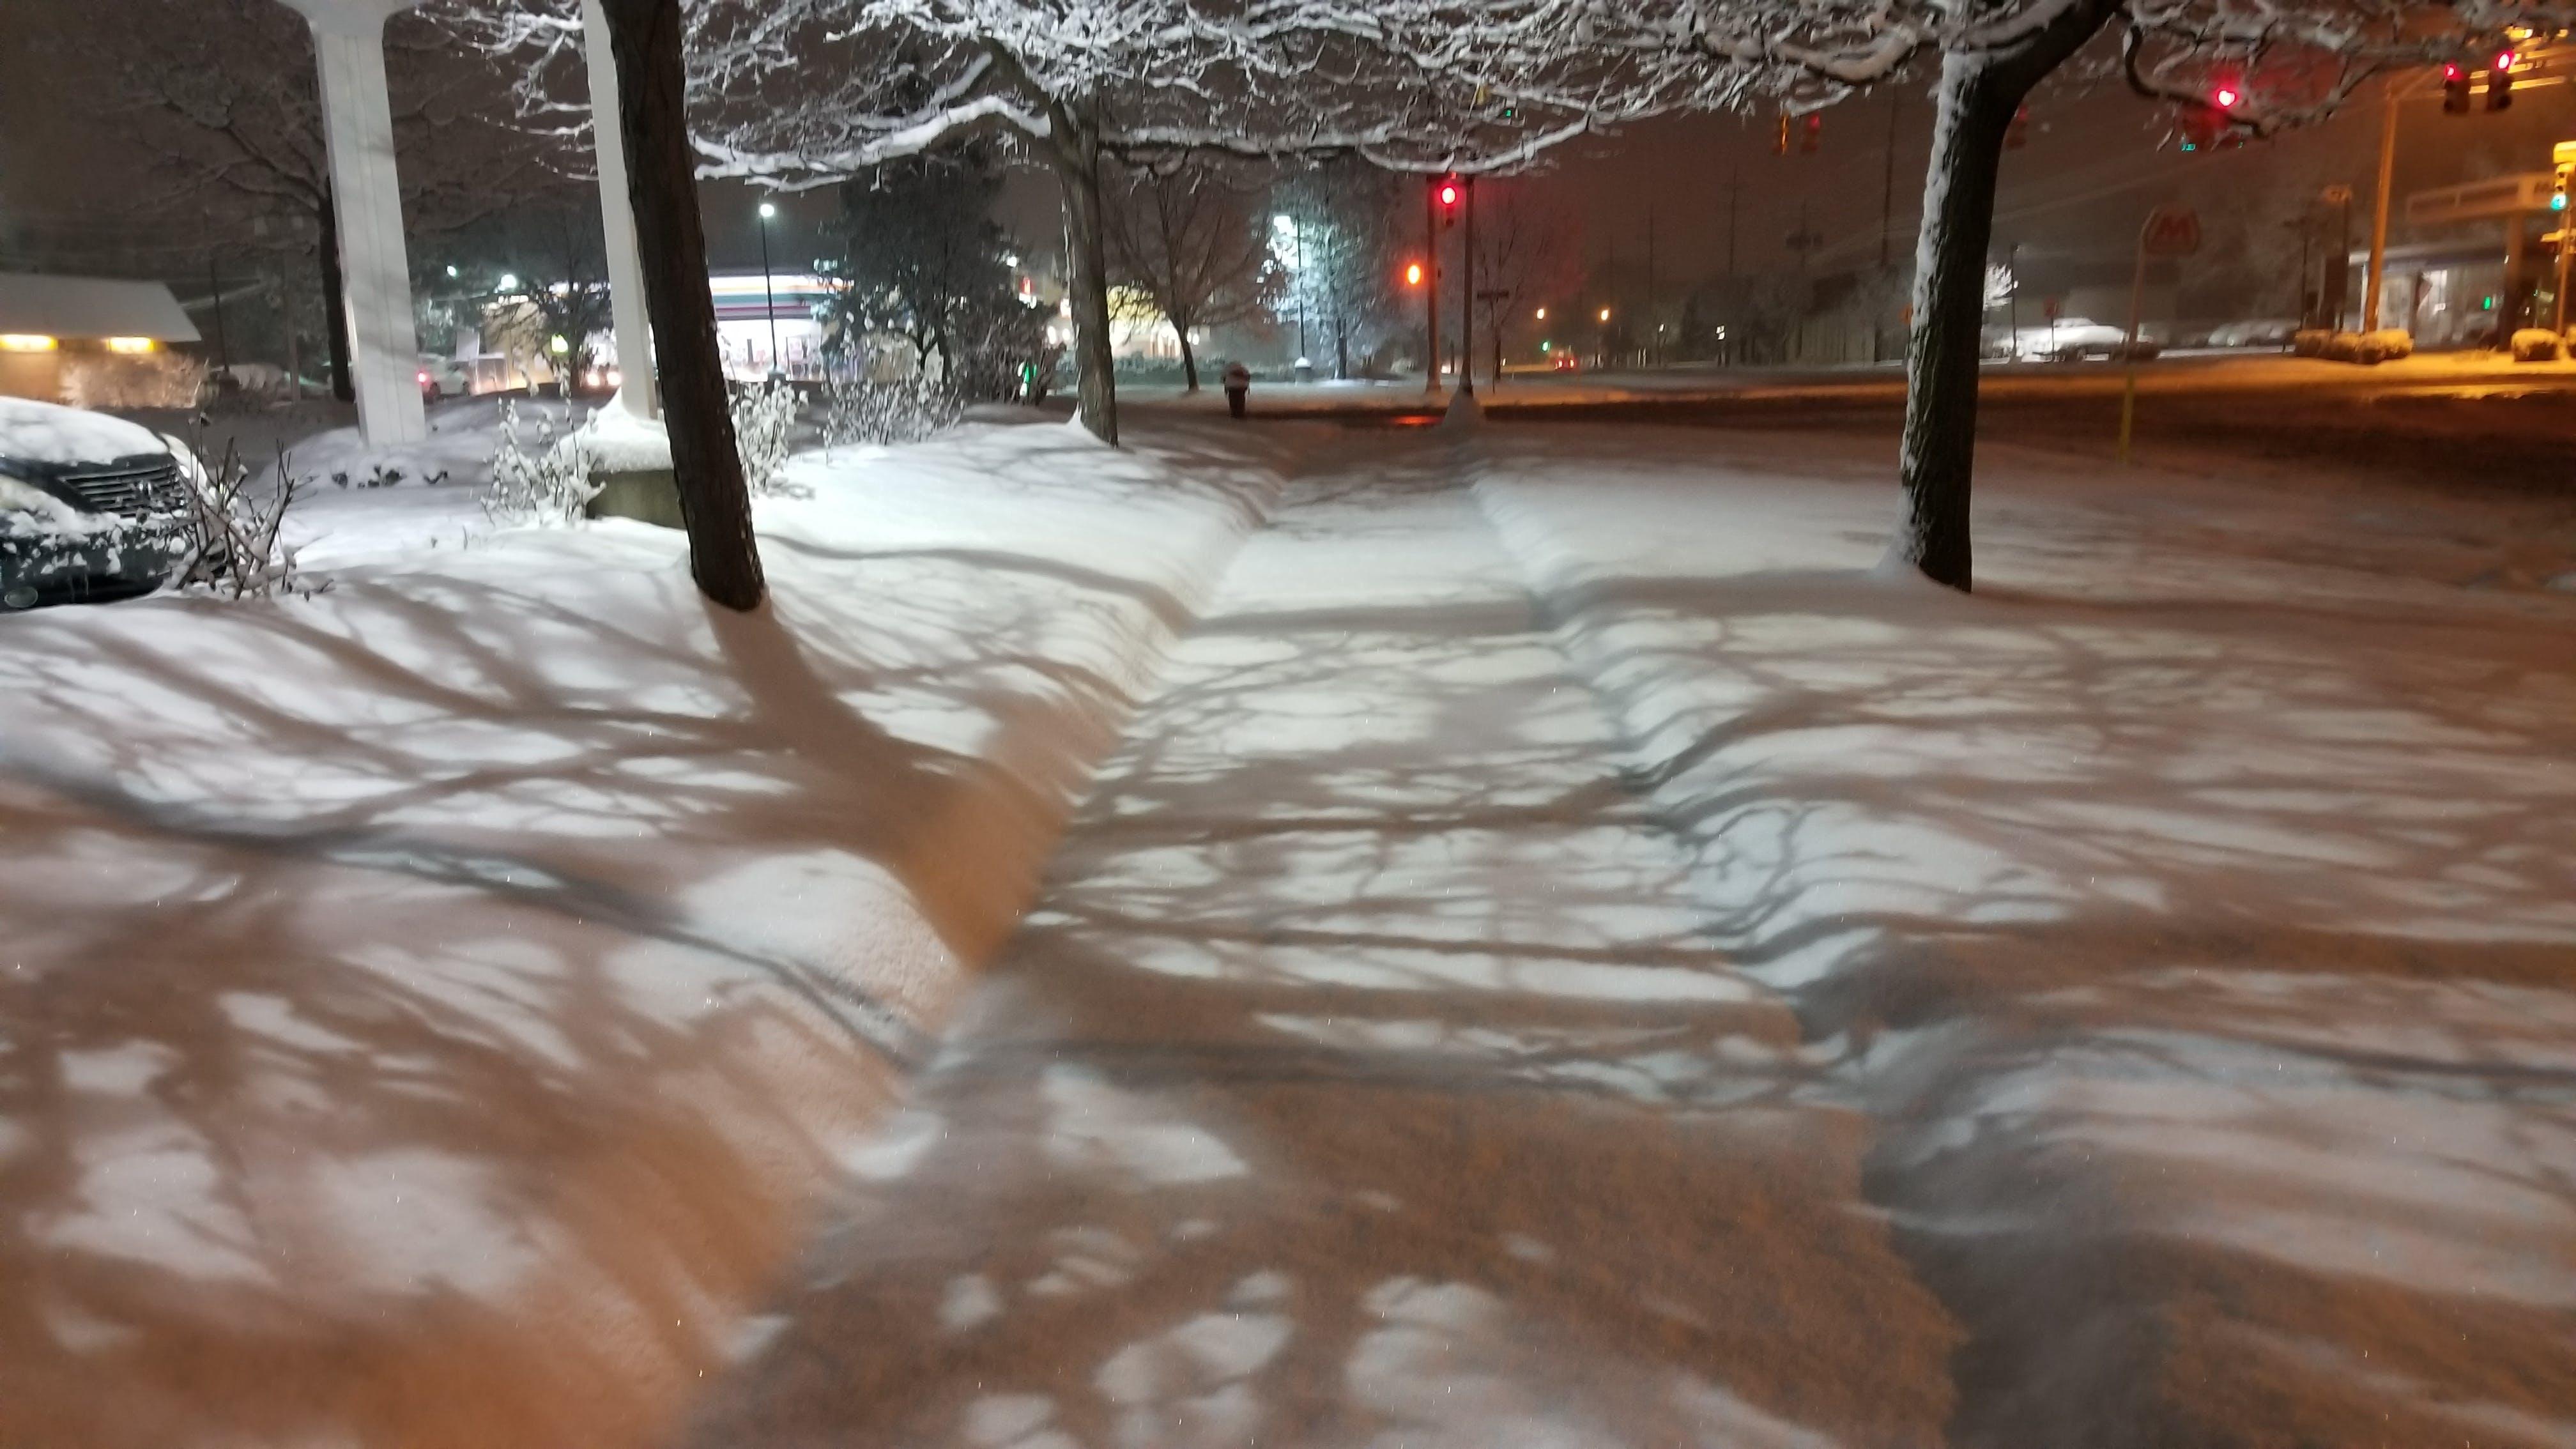 Free stock photo of snow, snowfall, snowstorm, snowy